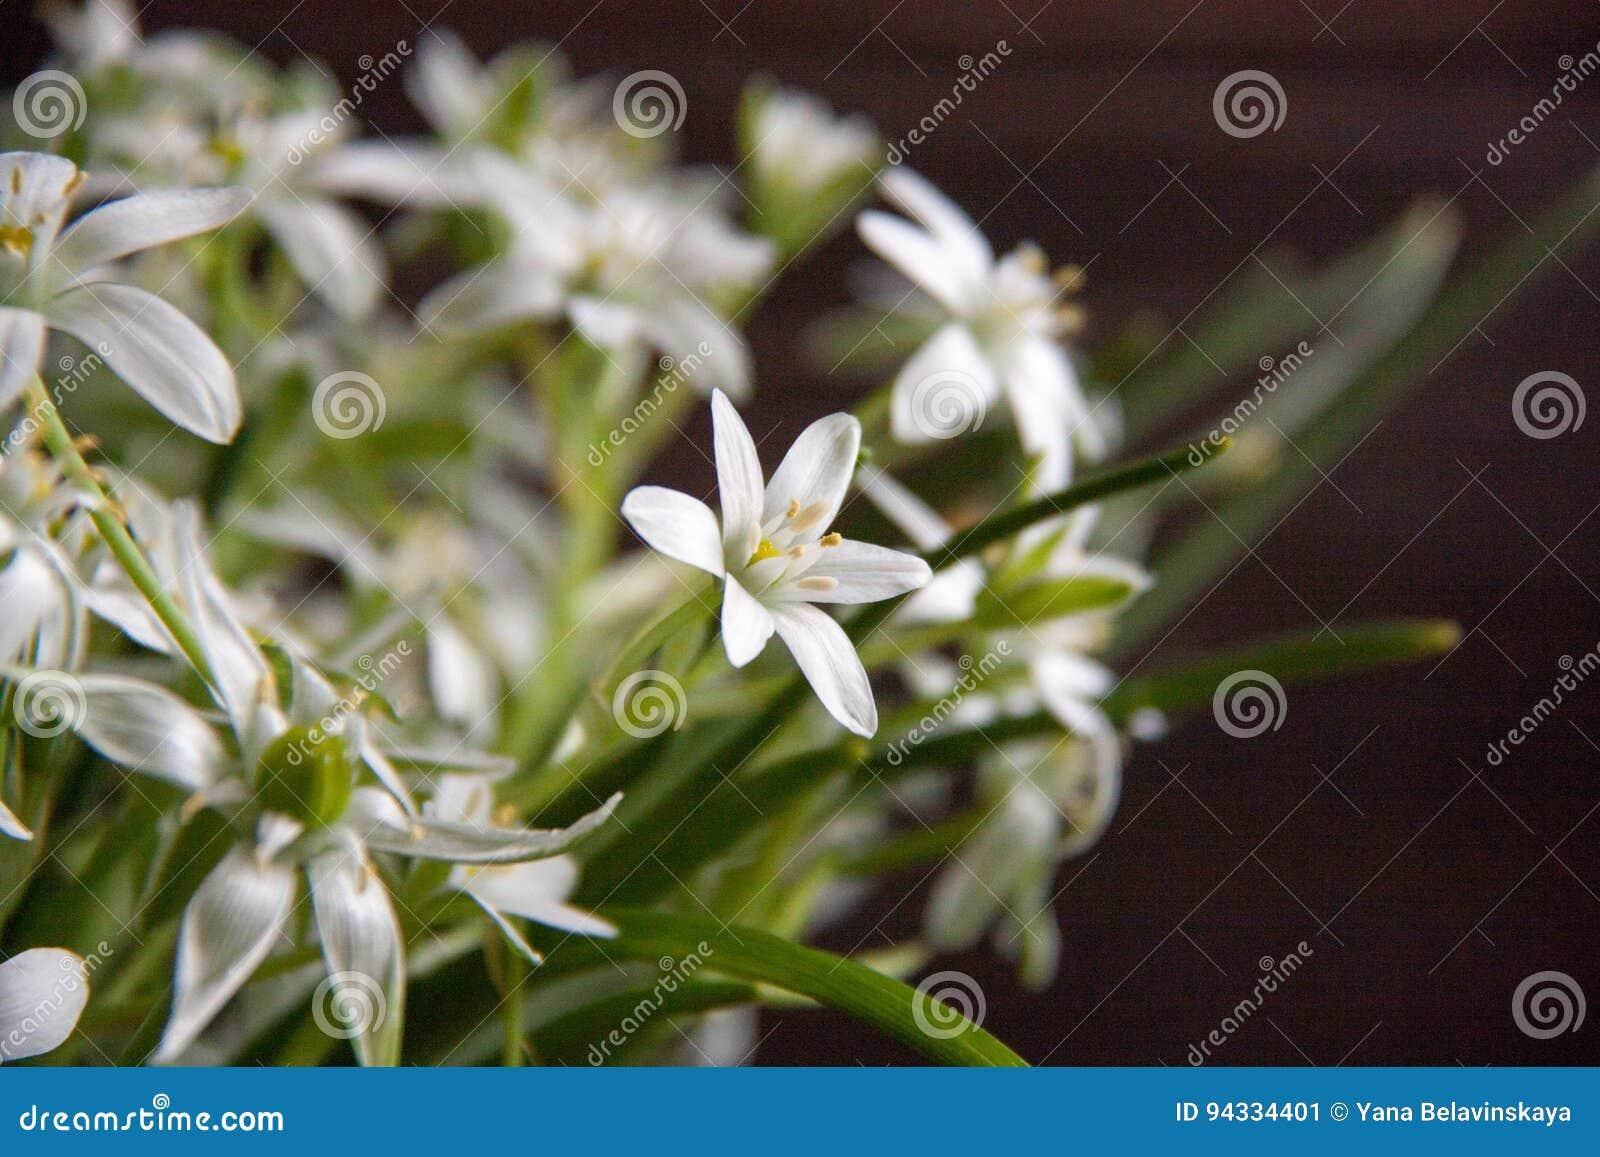 White Flowers Stock Image Image Of Good Fragrance Birdworm 94334401